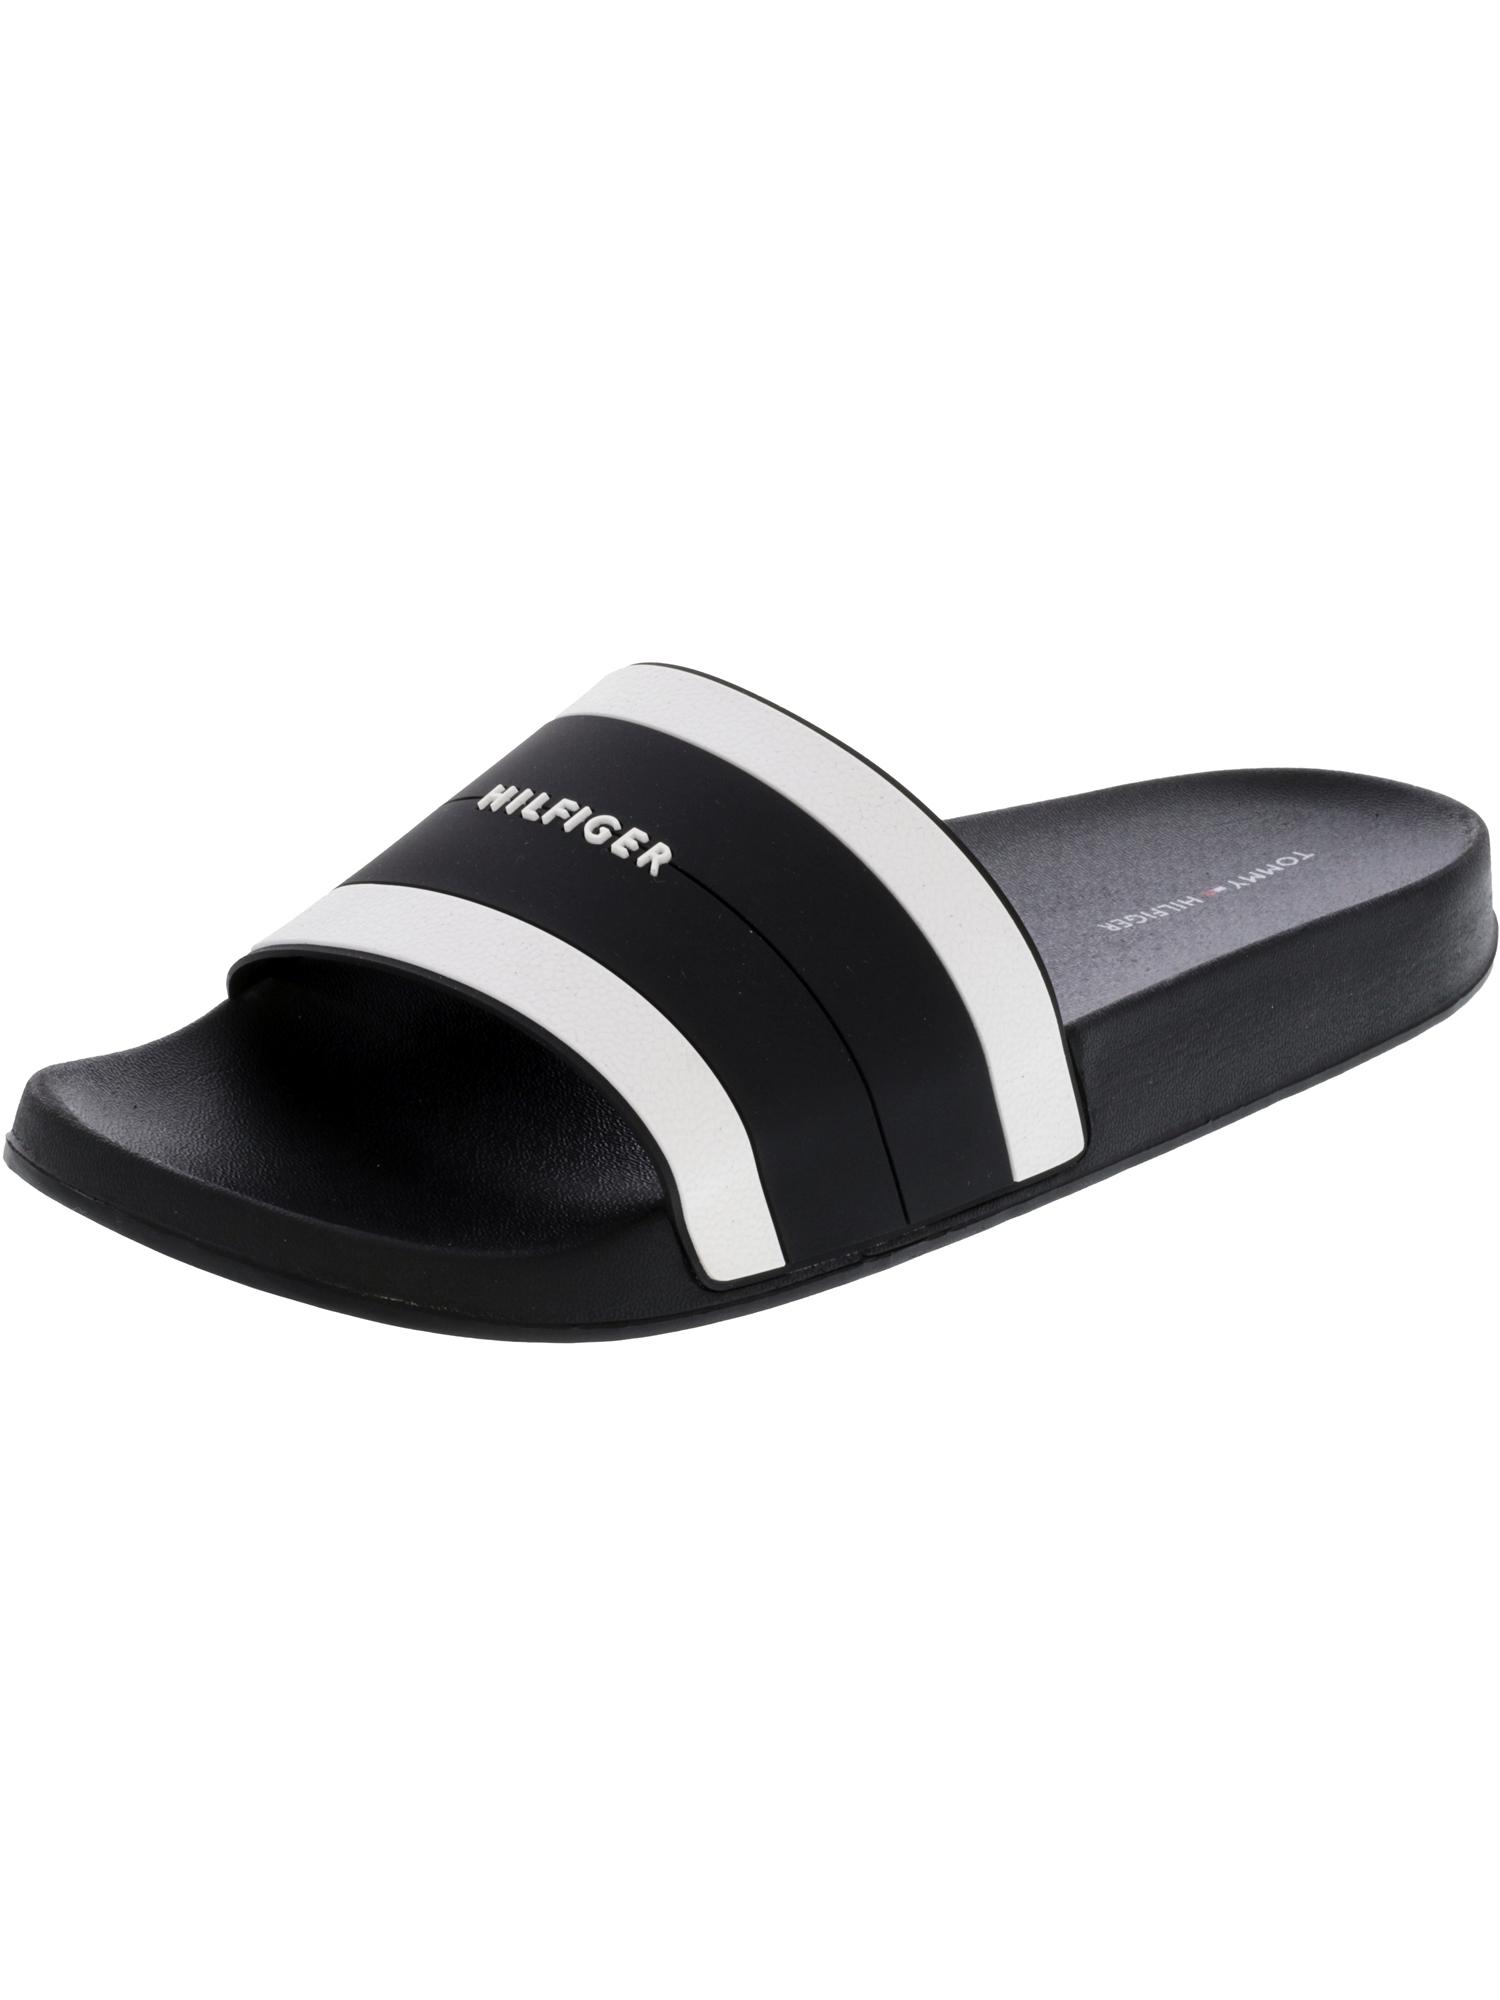 40ee79d9fad787 Tommy Hilfiger Women s Dria Black Sandal - 10M